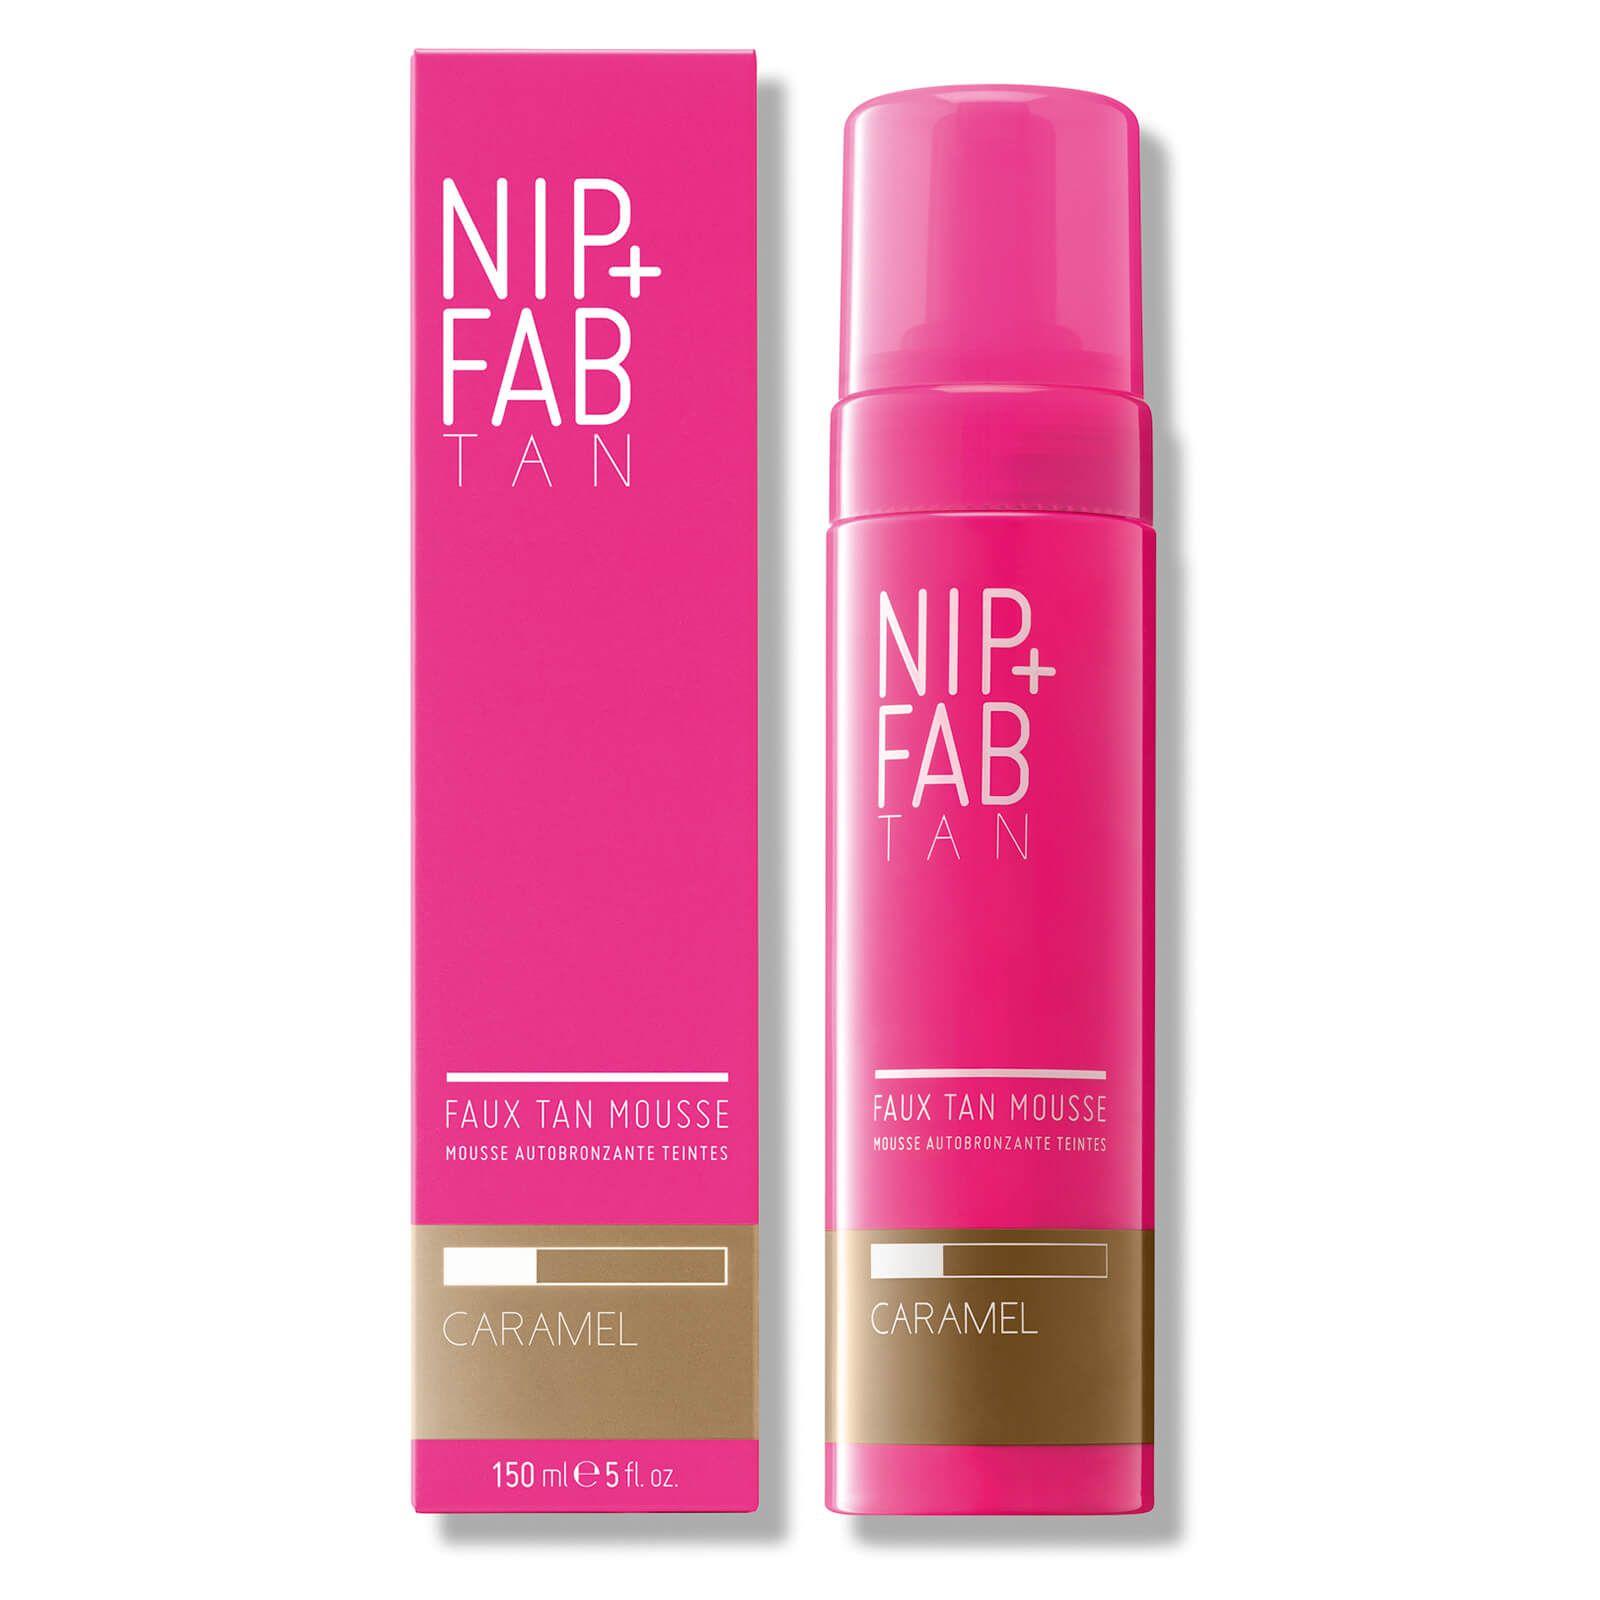 NIP+FAB Faux Tan Mousse 150ml - Caramel